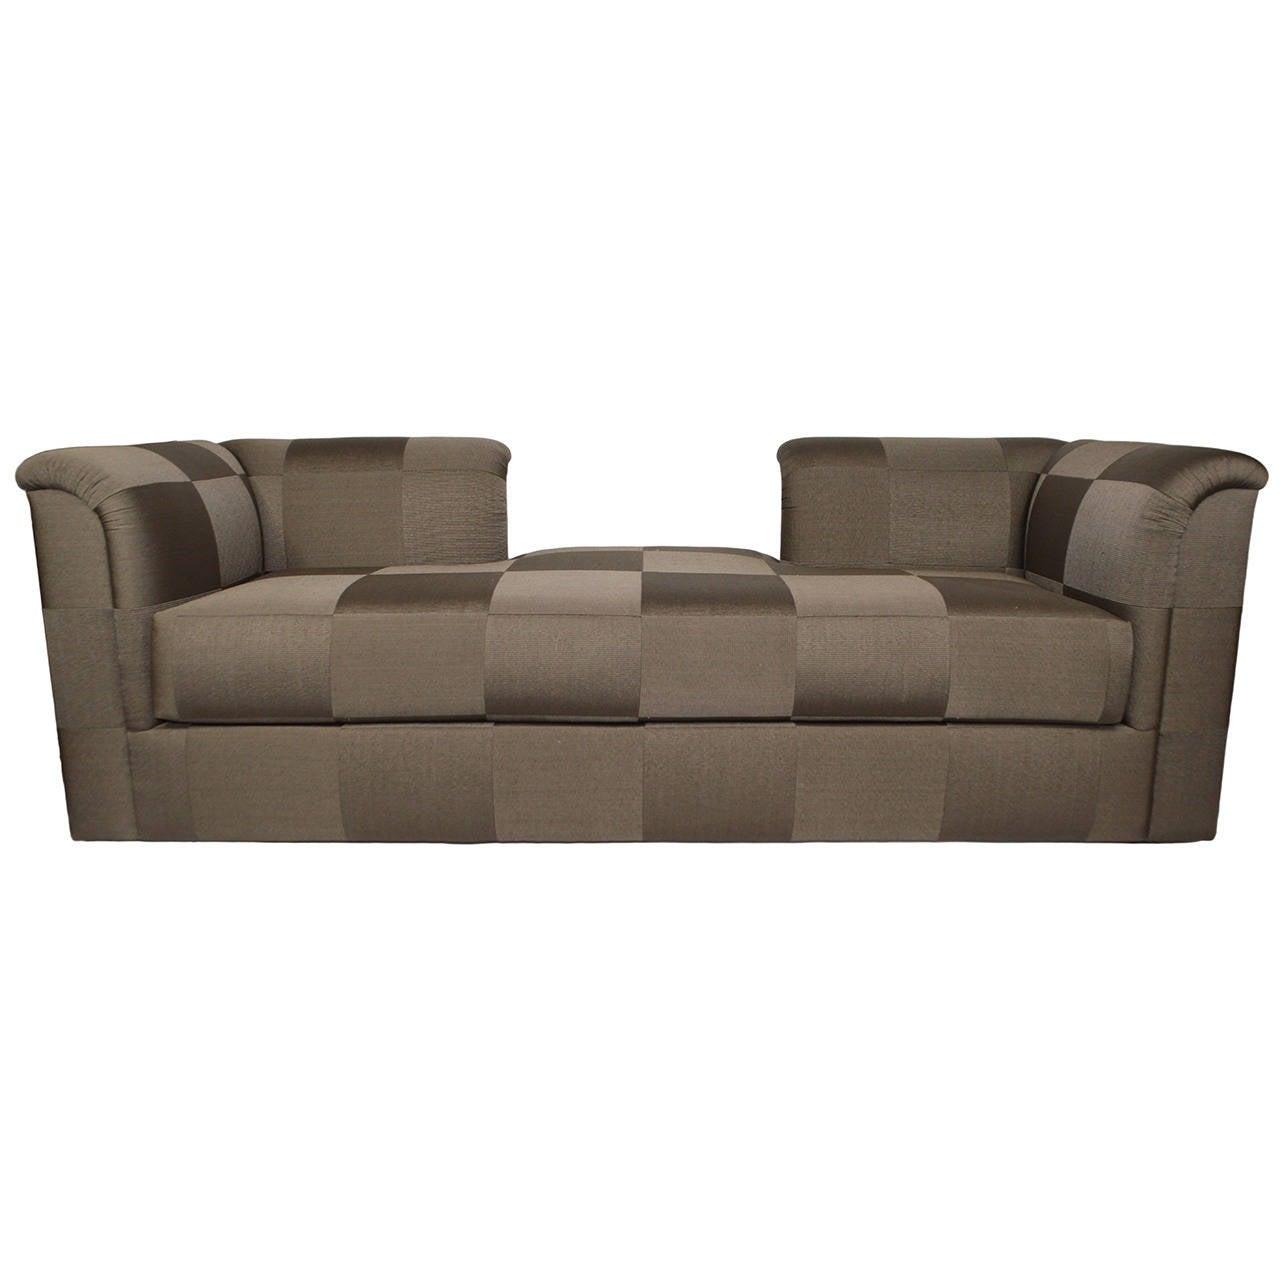 J Robert Scott French Line Tete A Tete Sofa At 1stdibs